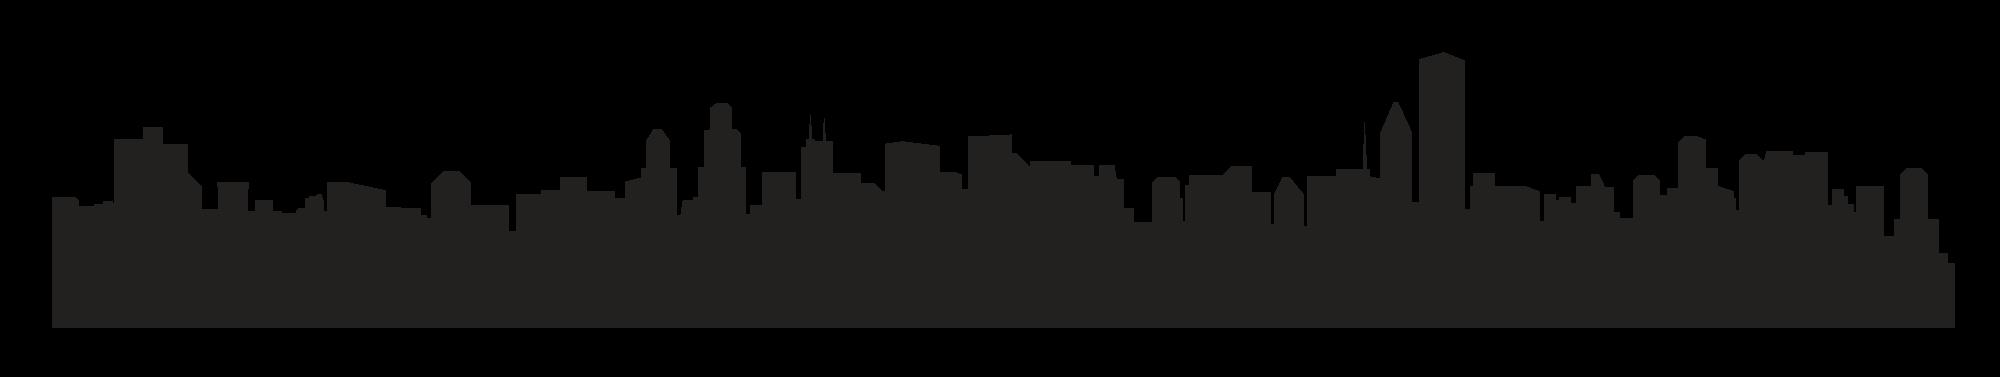 2000x377 Resources Serve The City International